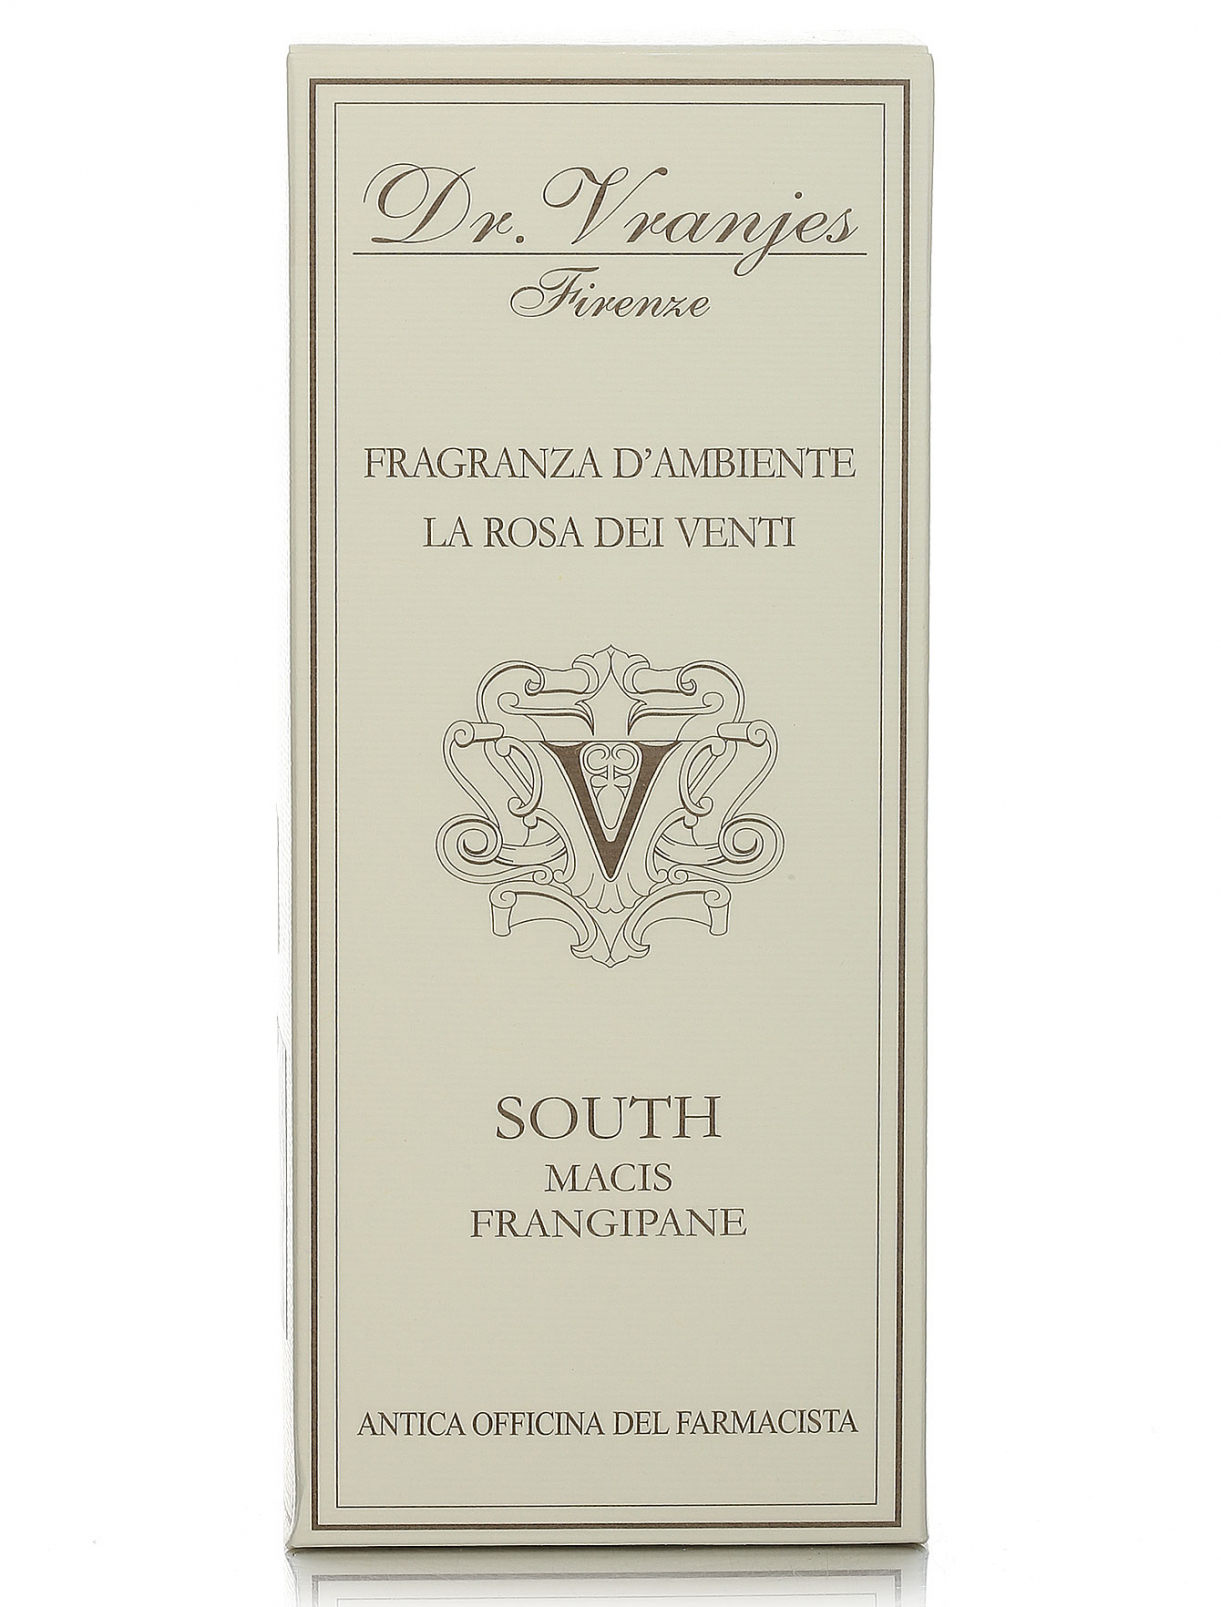 Ароматизатор воздуха South - Home Fragrance, 250ml Dr. Vranjes  –  Модель Общий вид